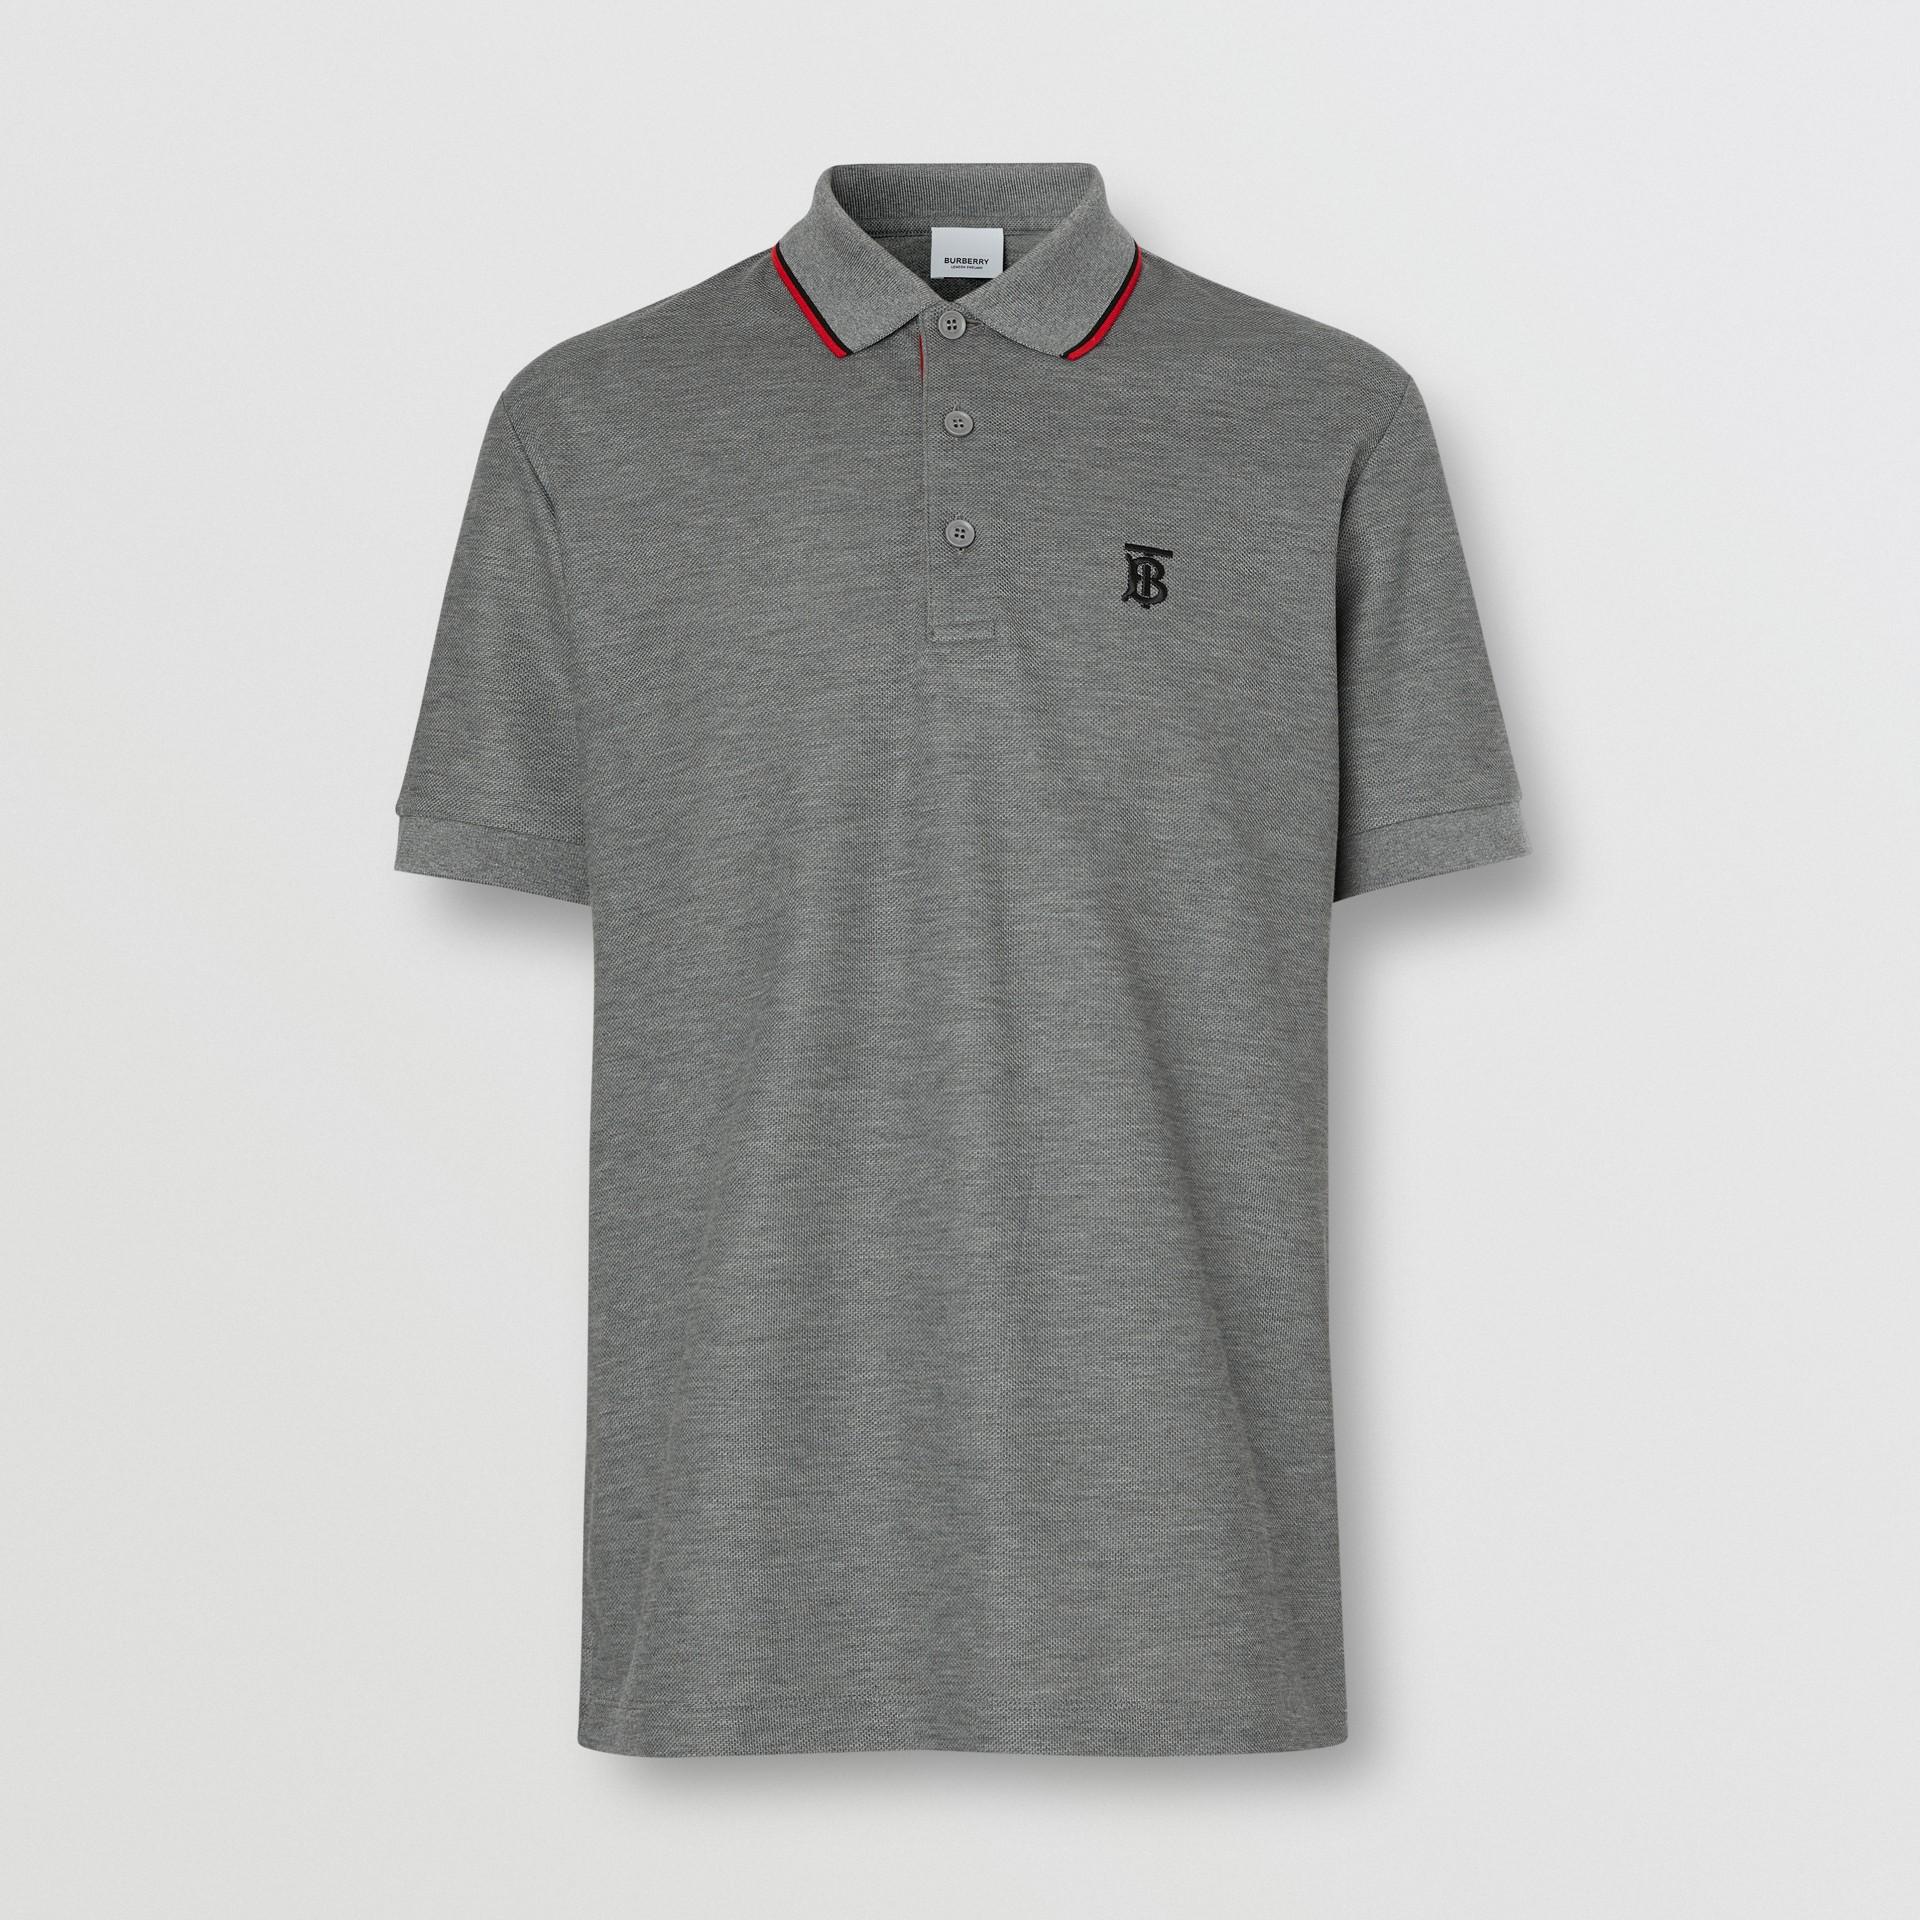 Monogram Motif Cotton Piqué Polo Shirt in Mid Grey Melange - Men | Burberry - gallery image 3